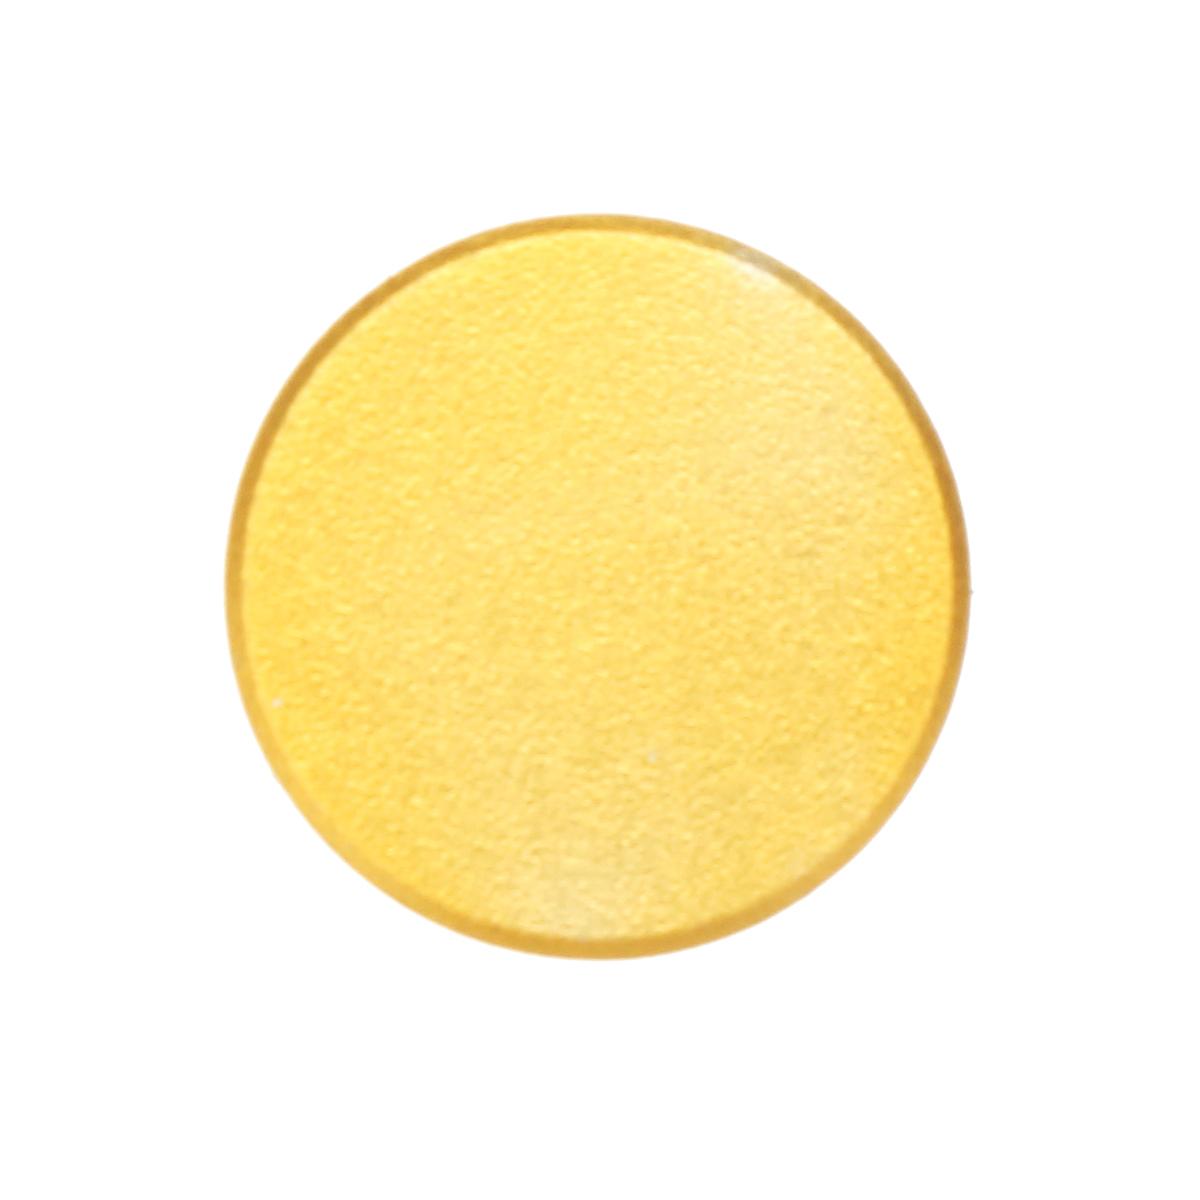 Golden Aluminum Alloy Shutter Release Button for Fuji Fujifilm X-E1 X-Pro1 X10 X